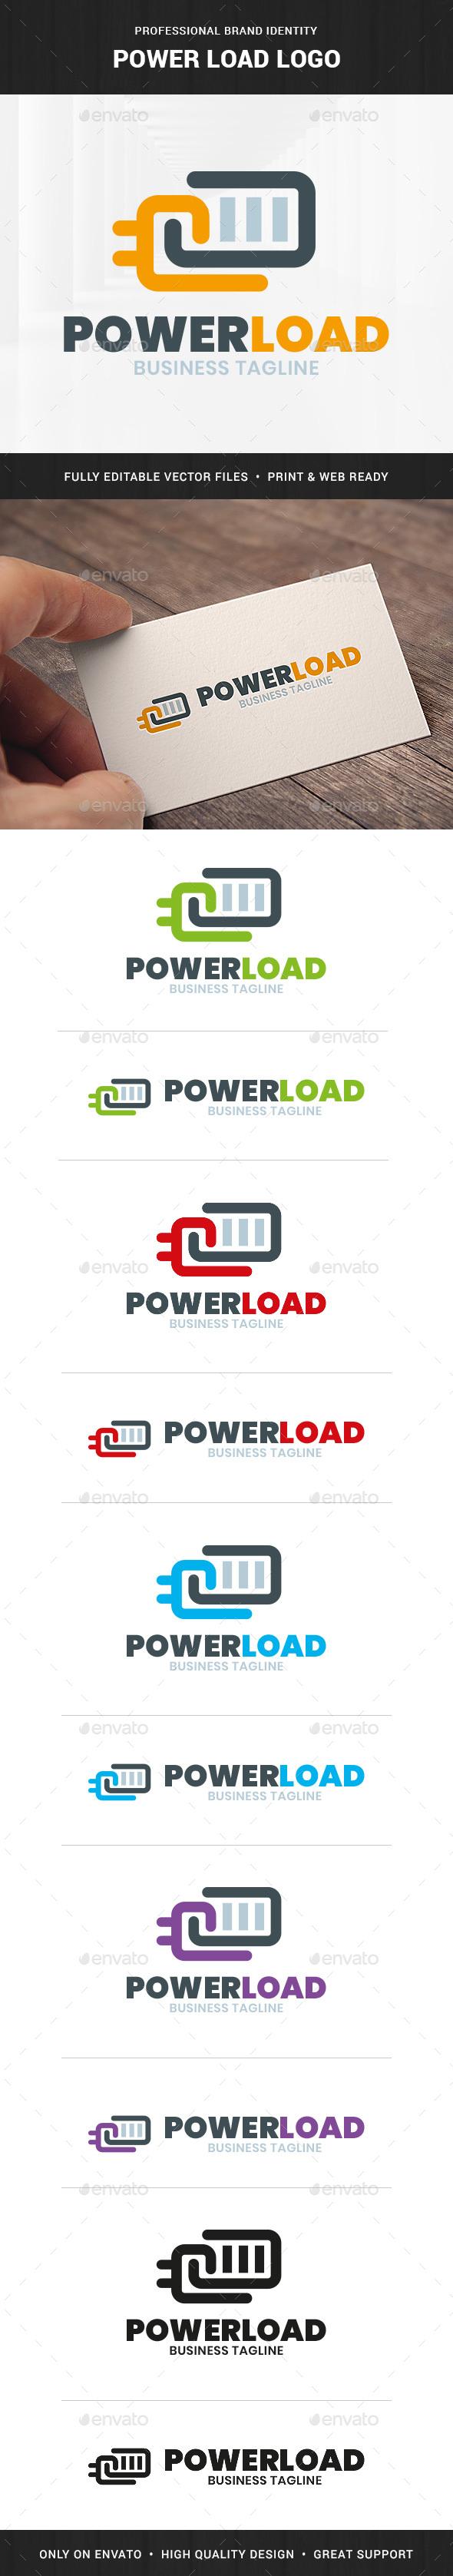 Power Load - Battery Logo Template